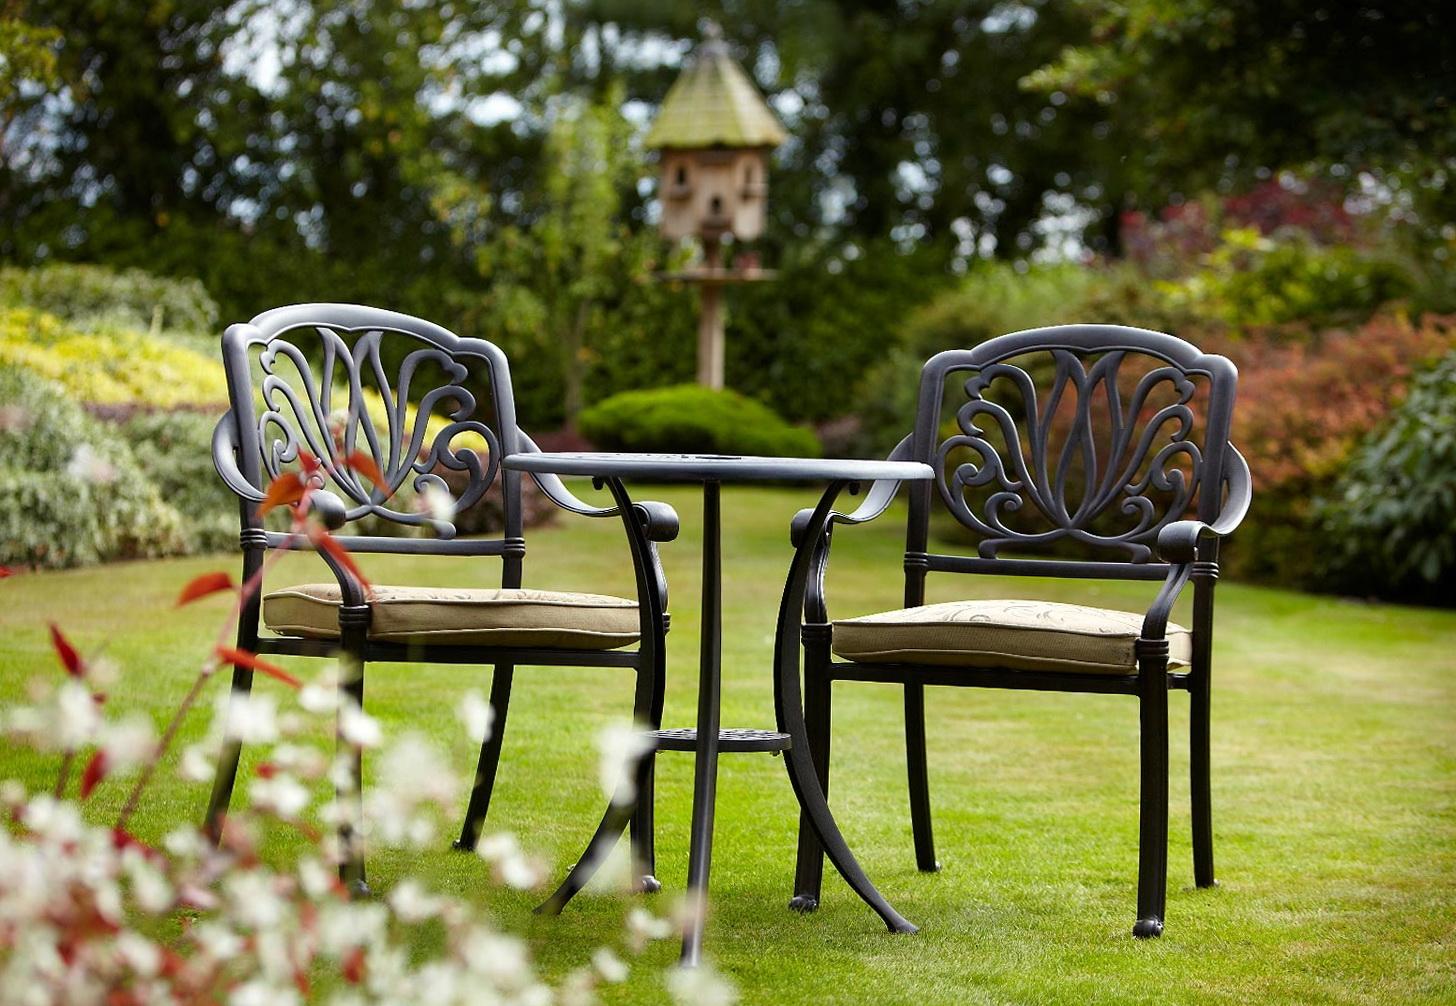 Garden Treasures Patio Furniture Replacement Parts